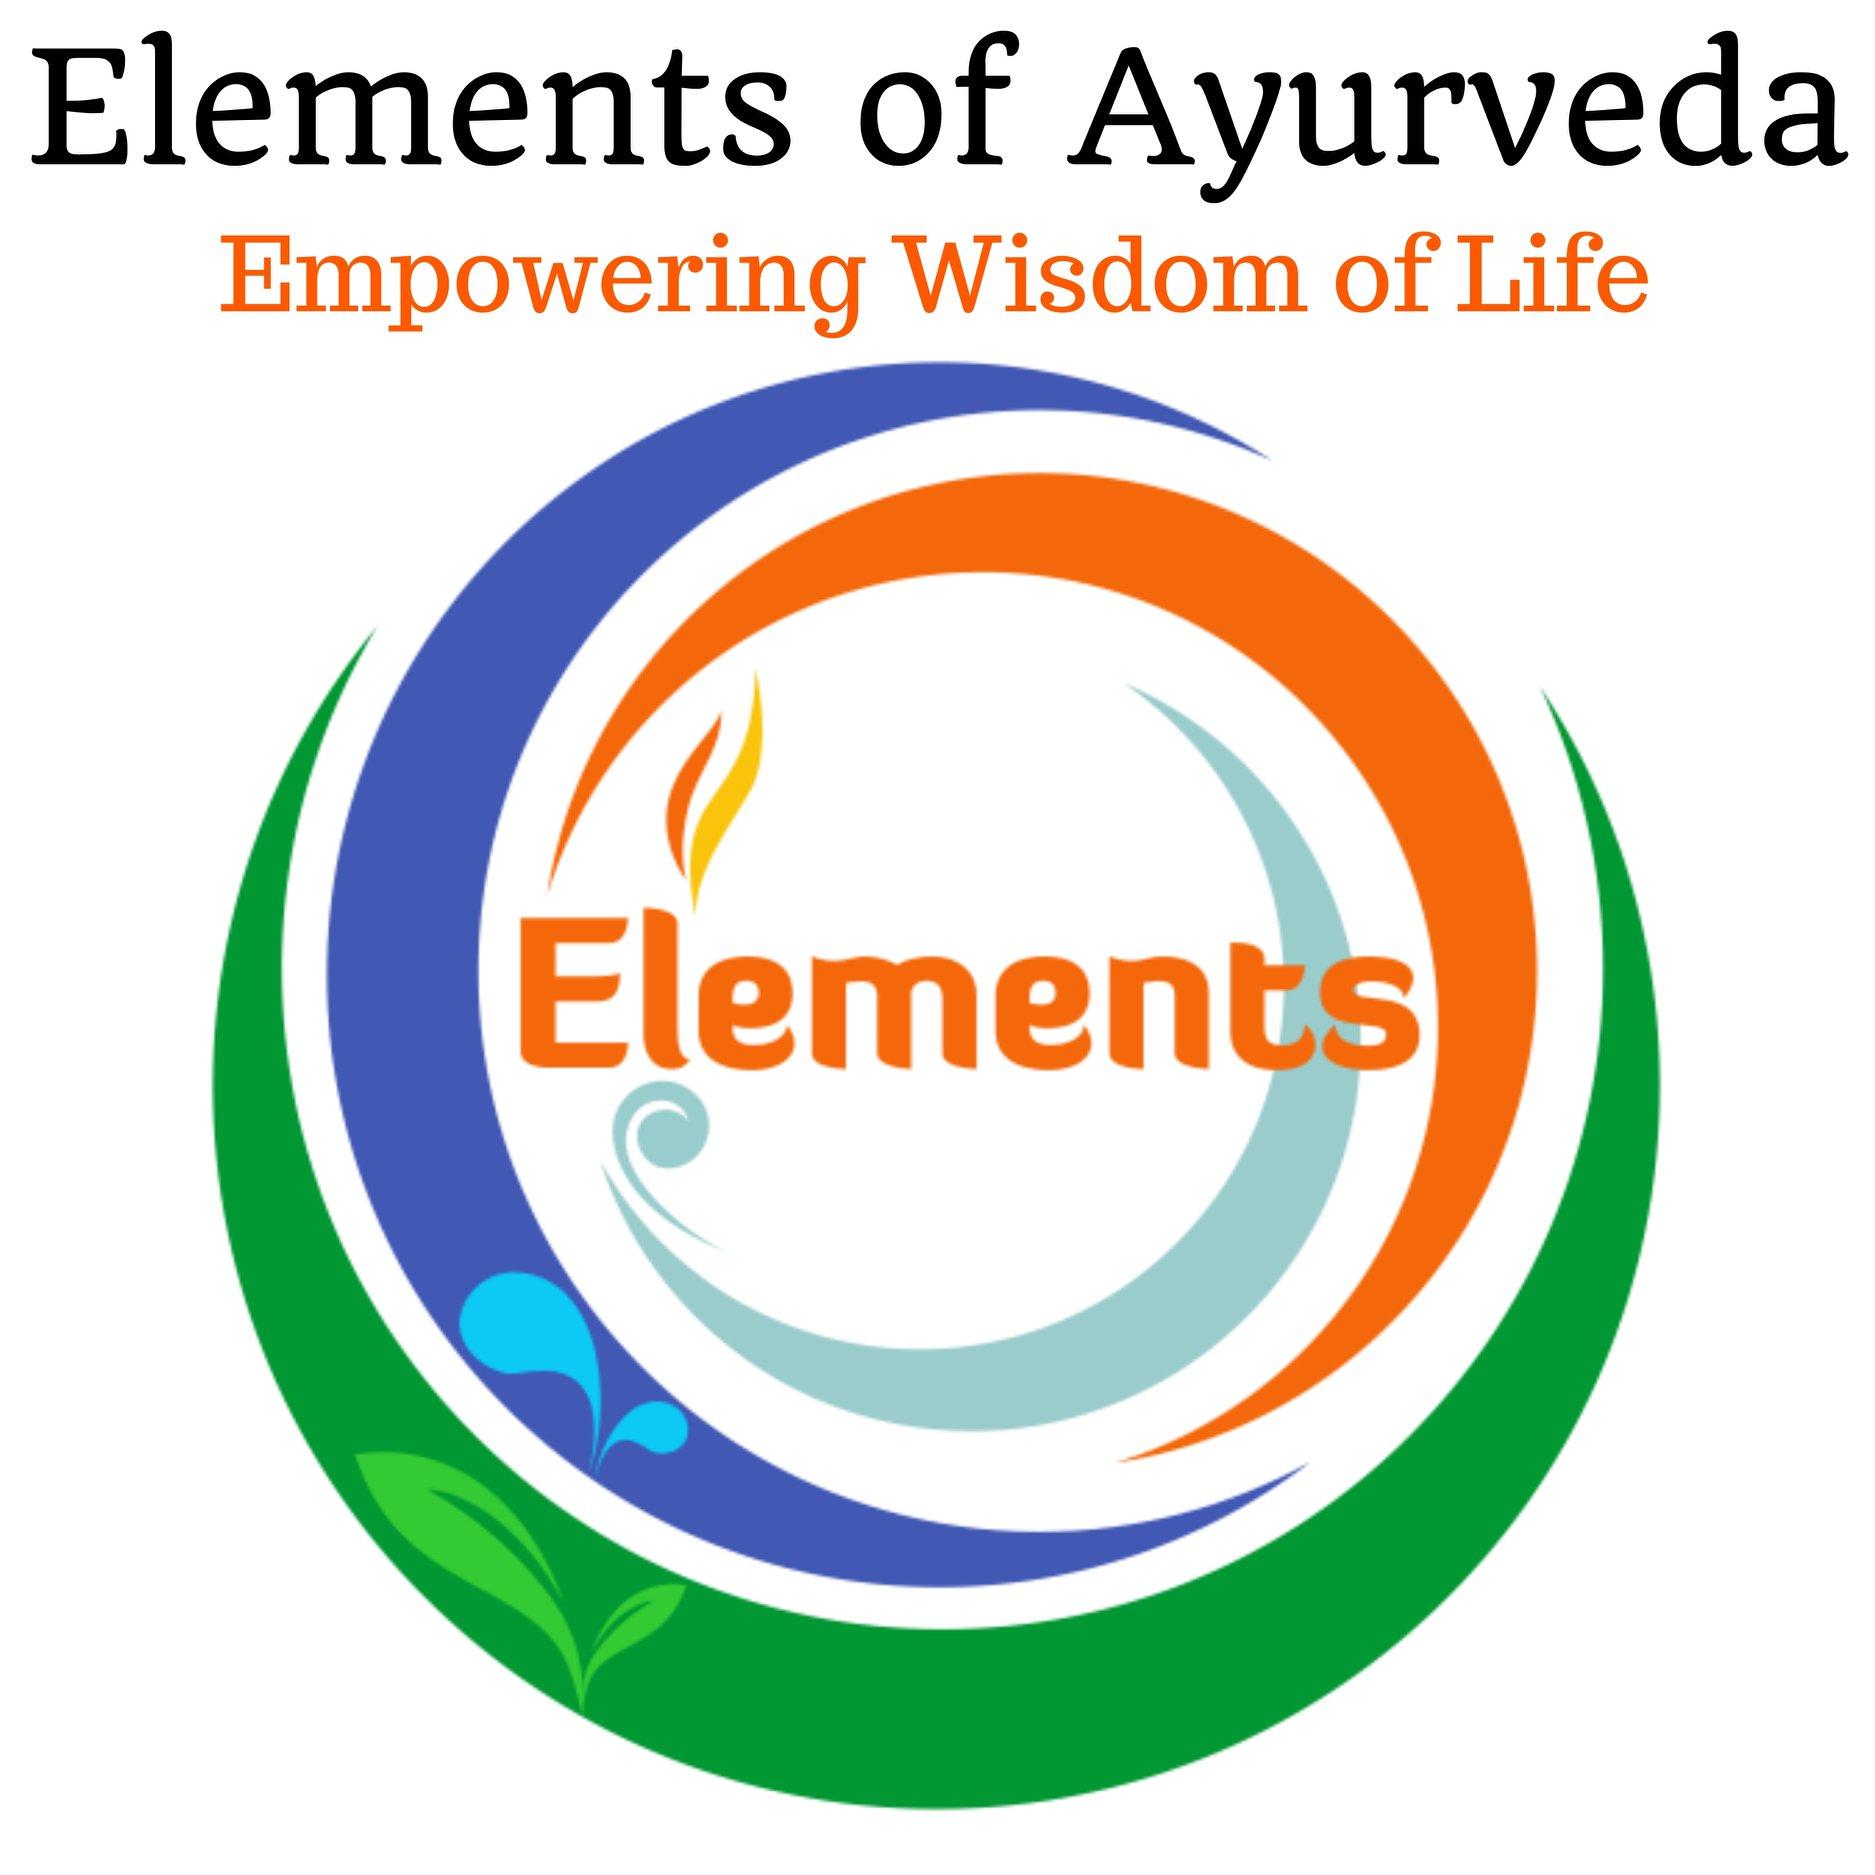 Elements of Ayurveda show art